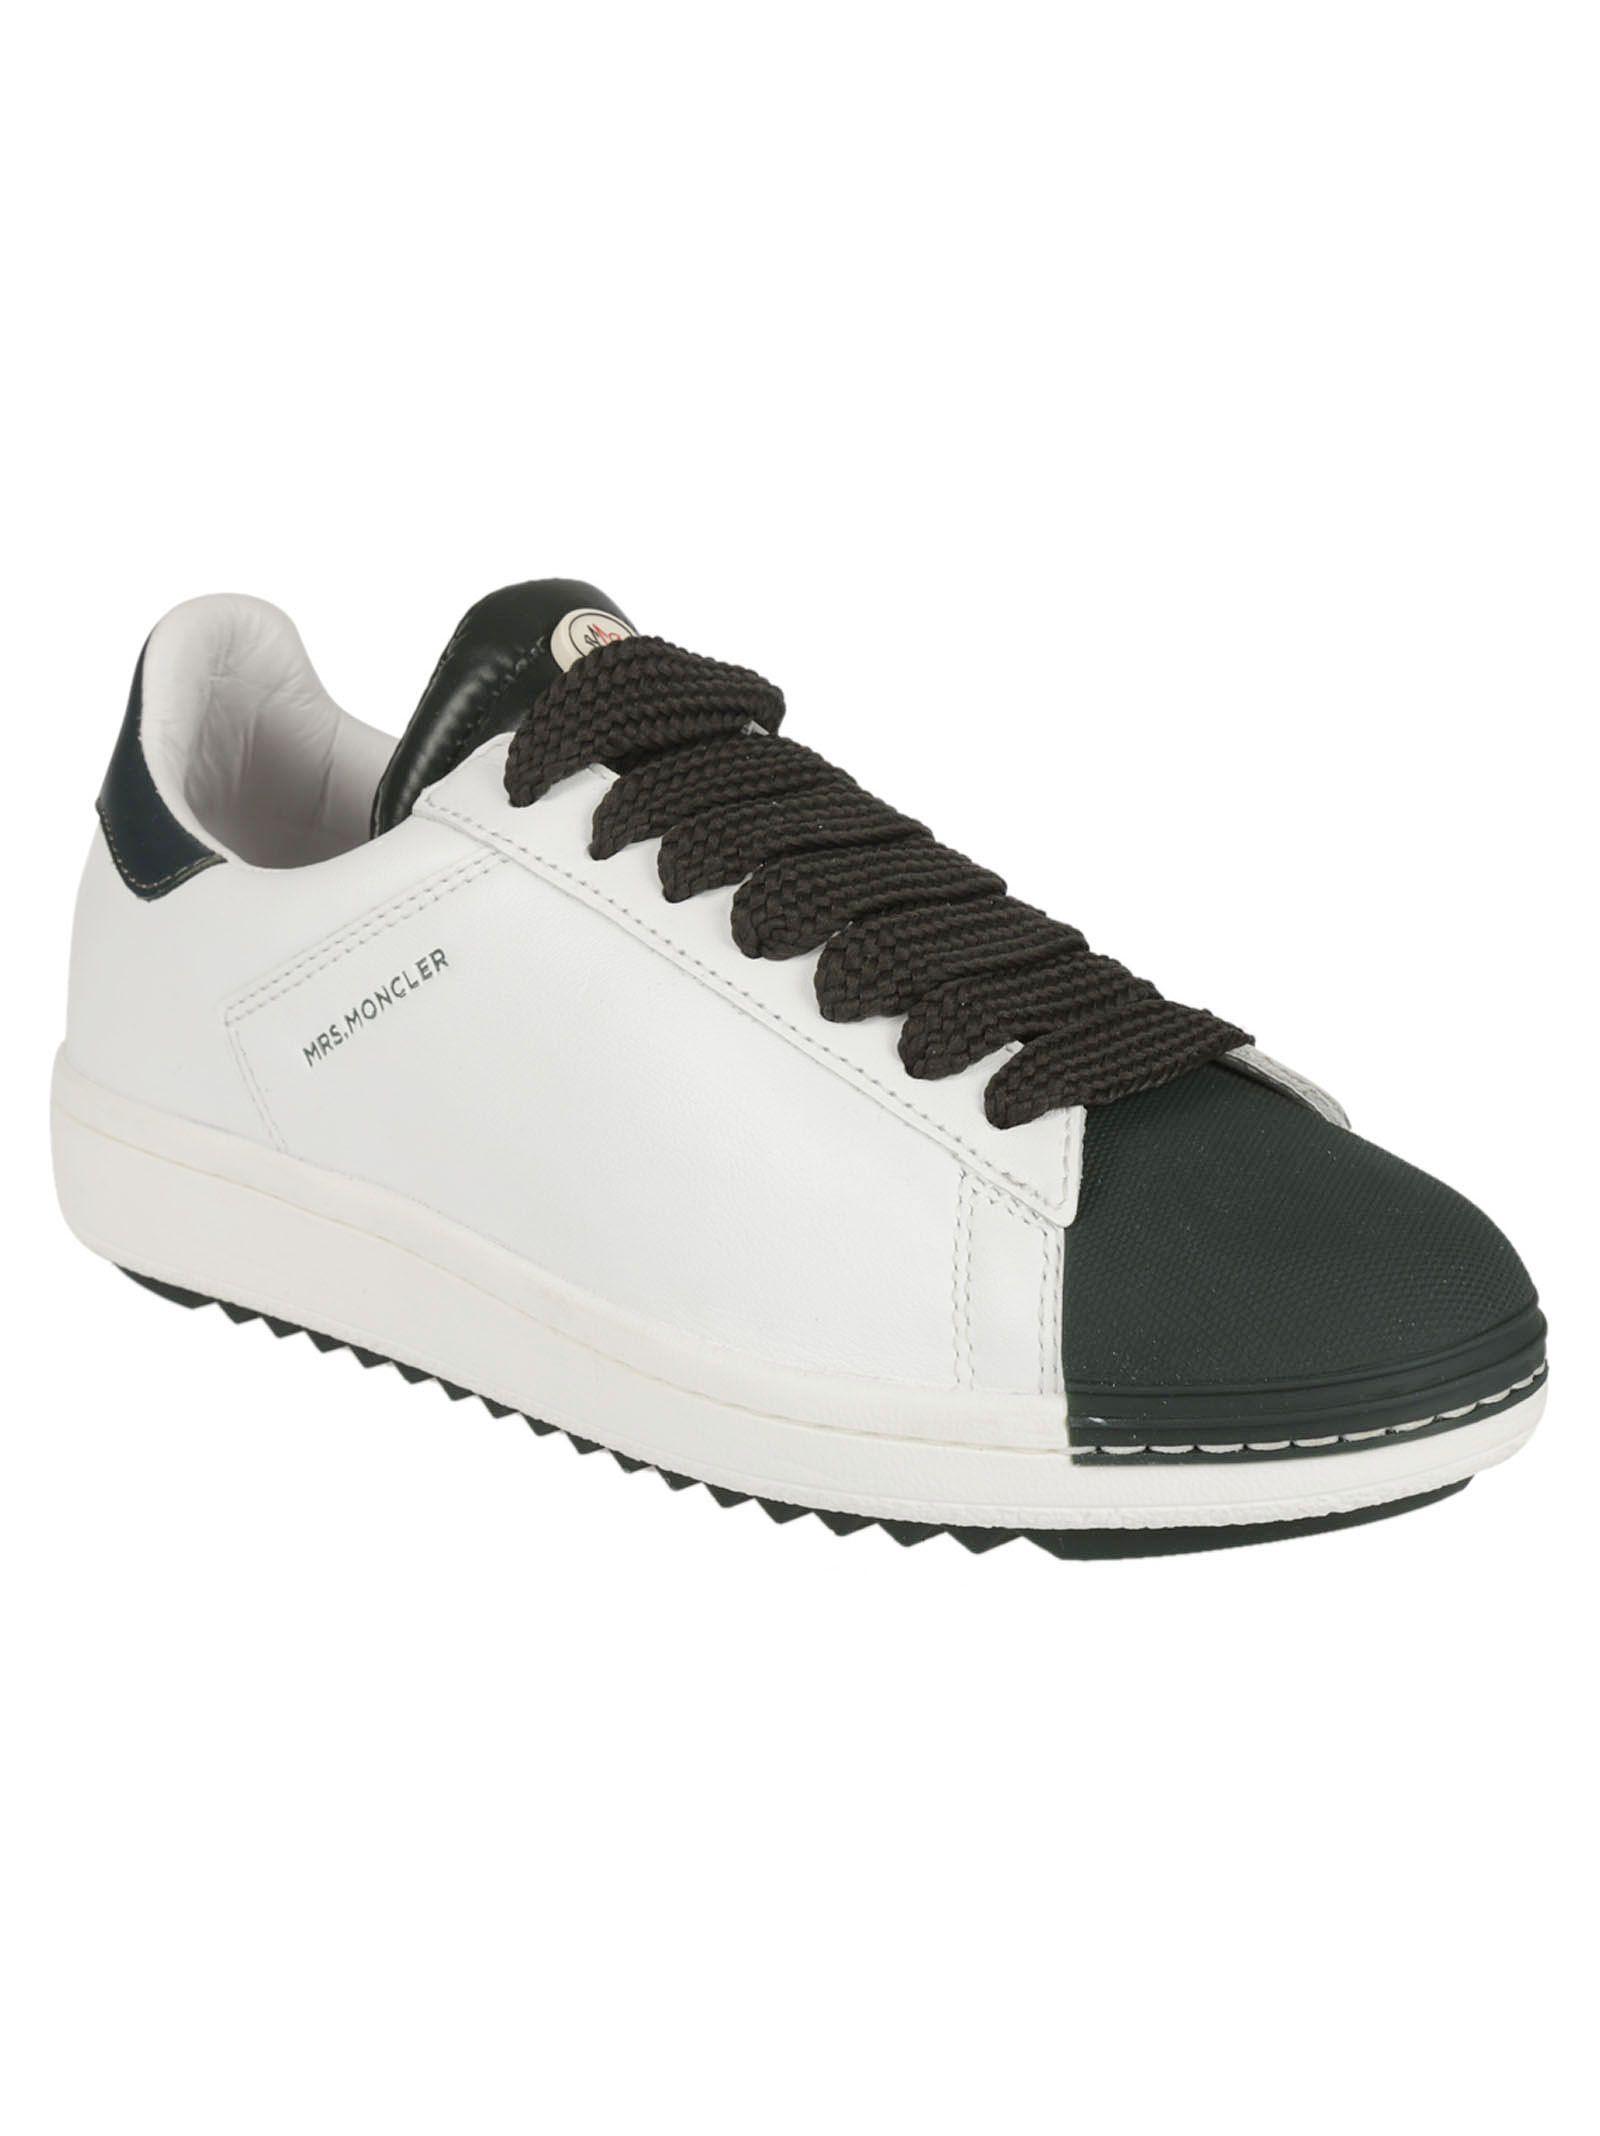 Pantofi sport de damă MONCLER